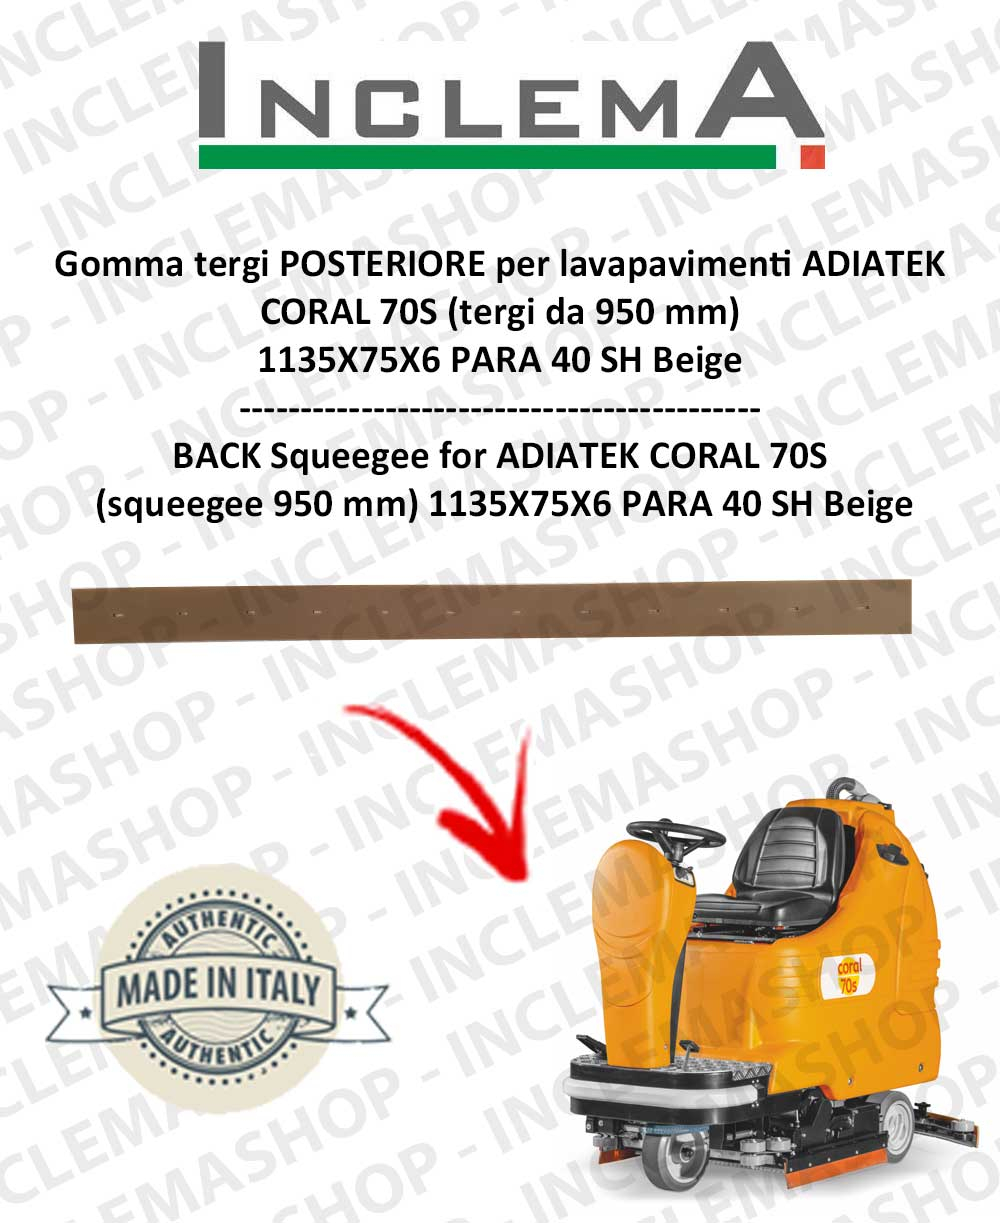 Gomma tergi POSTERIORE per lavapavimenti CORAL 70S ADIATEK (tergi da 950 mm)